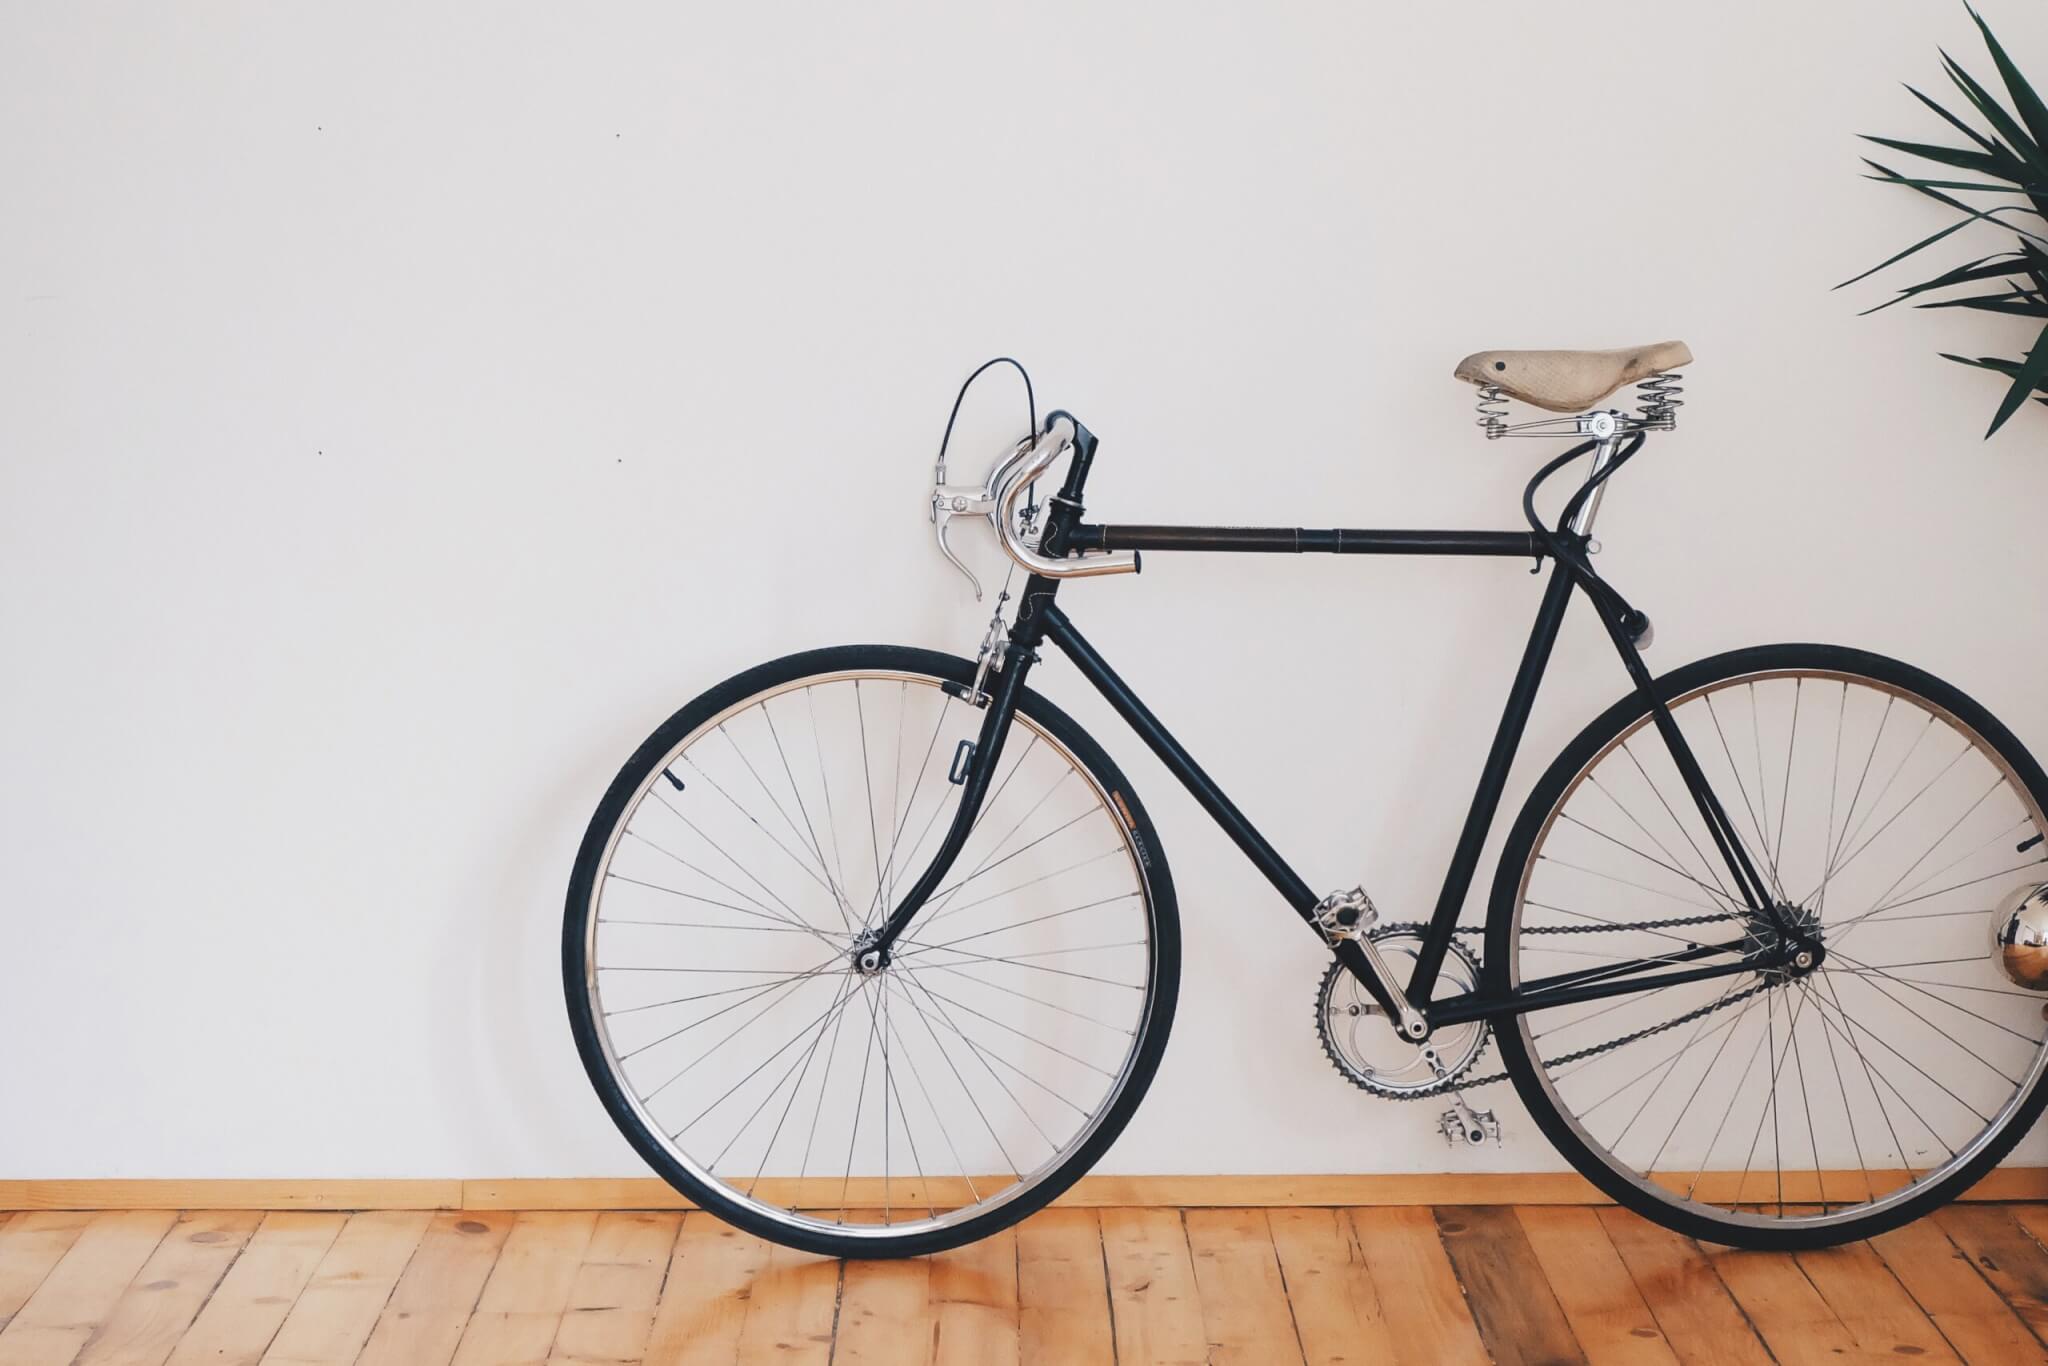 bike stored inside